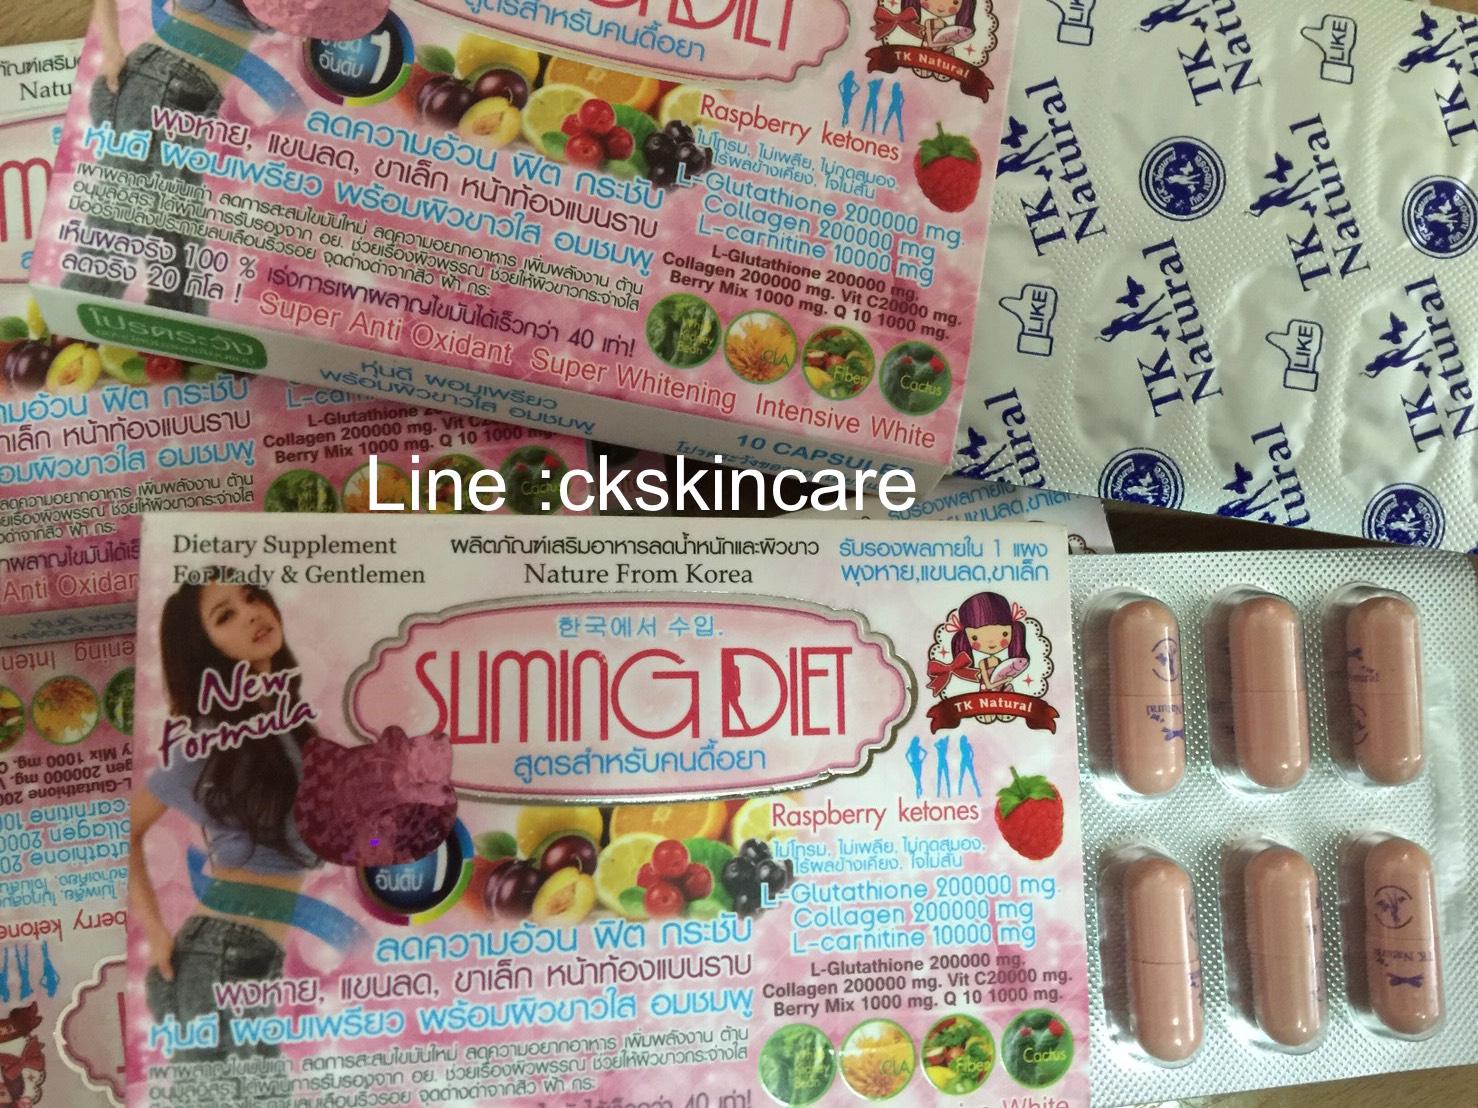 Sliming Diet Raspberry Ketone ชนิดแผง